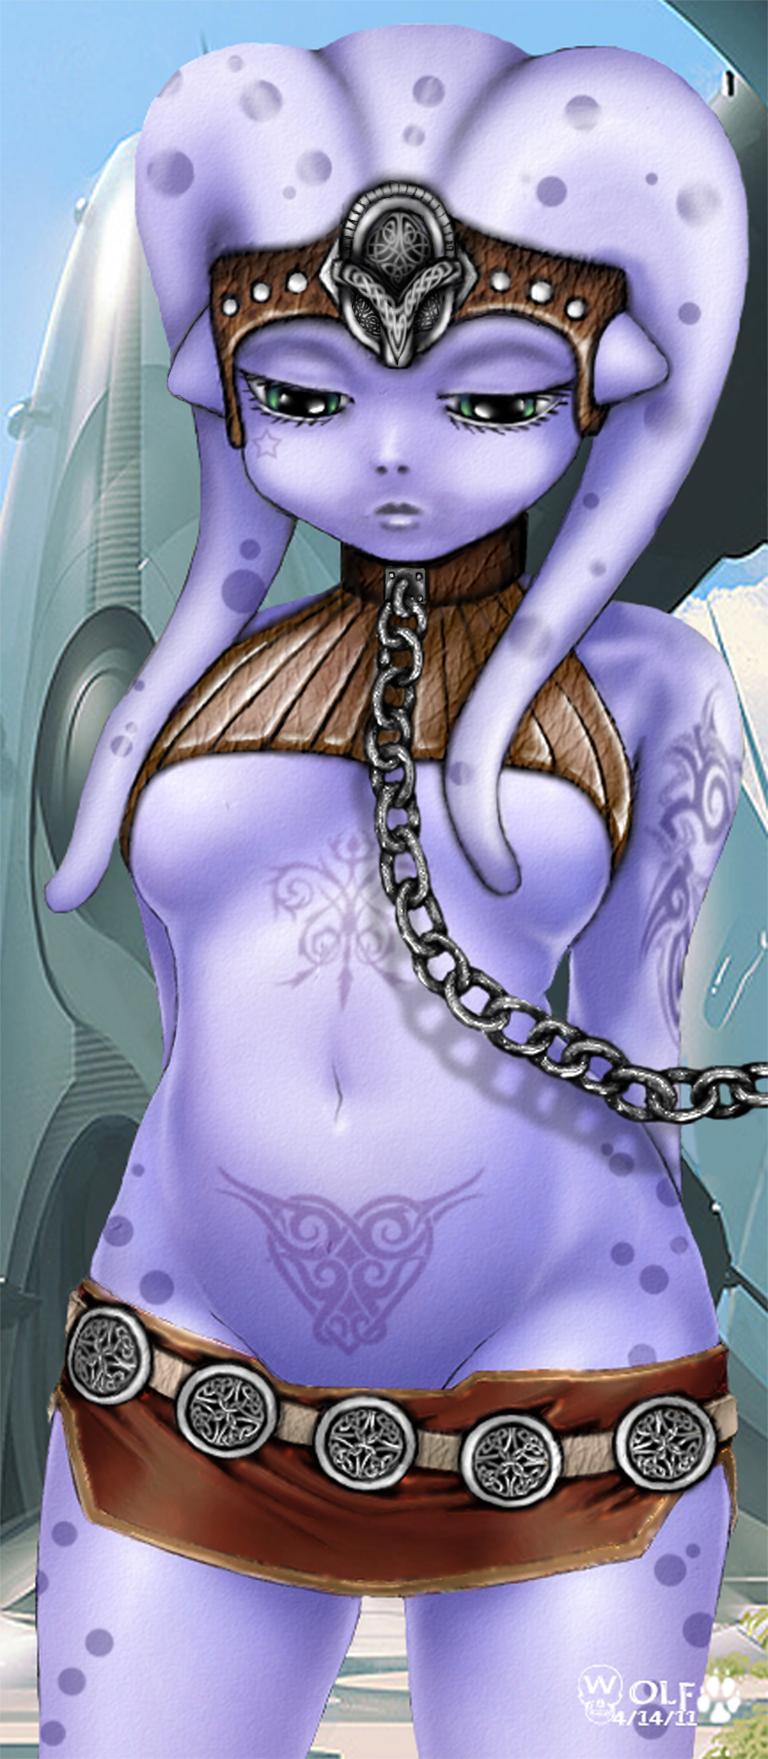 Monsteranimeporn nackt photo